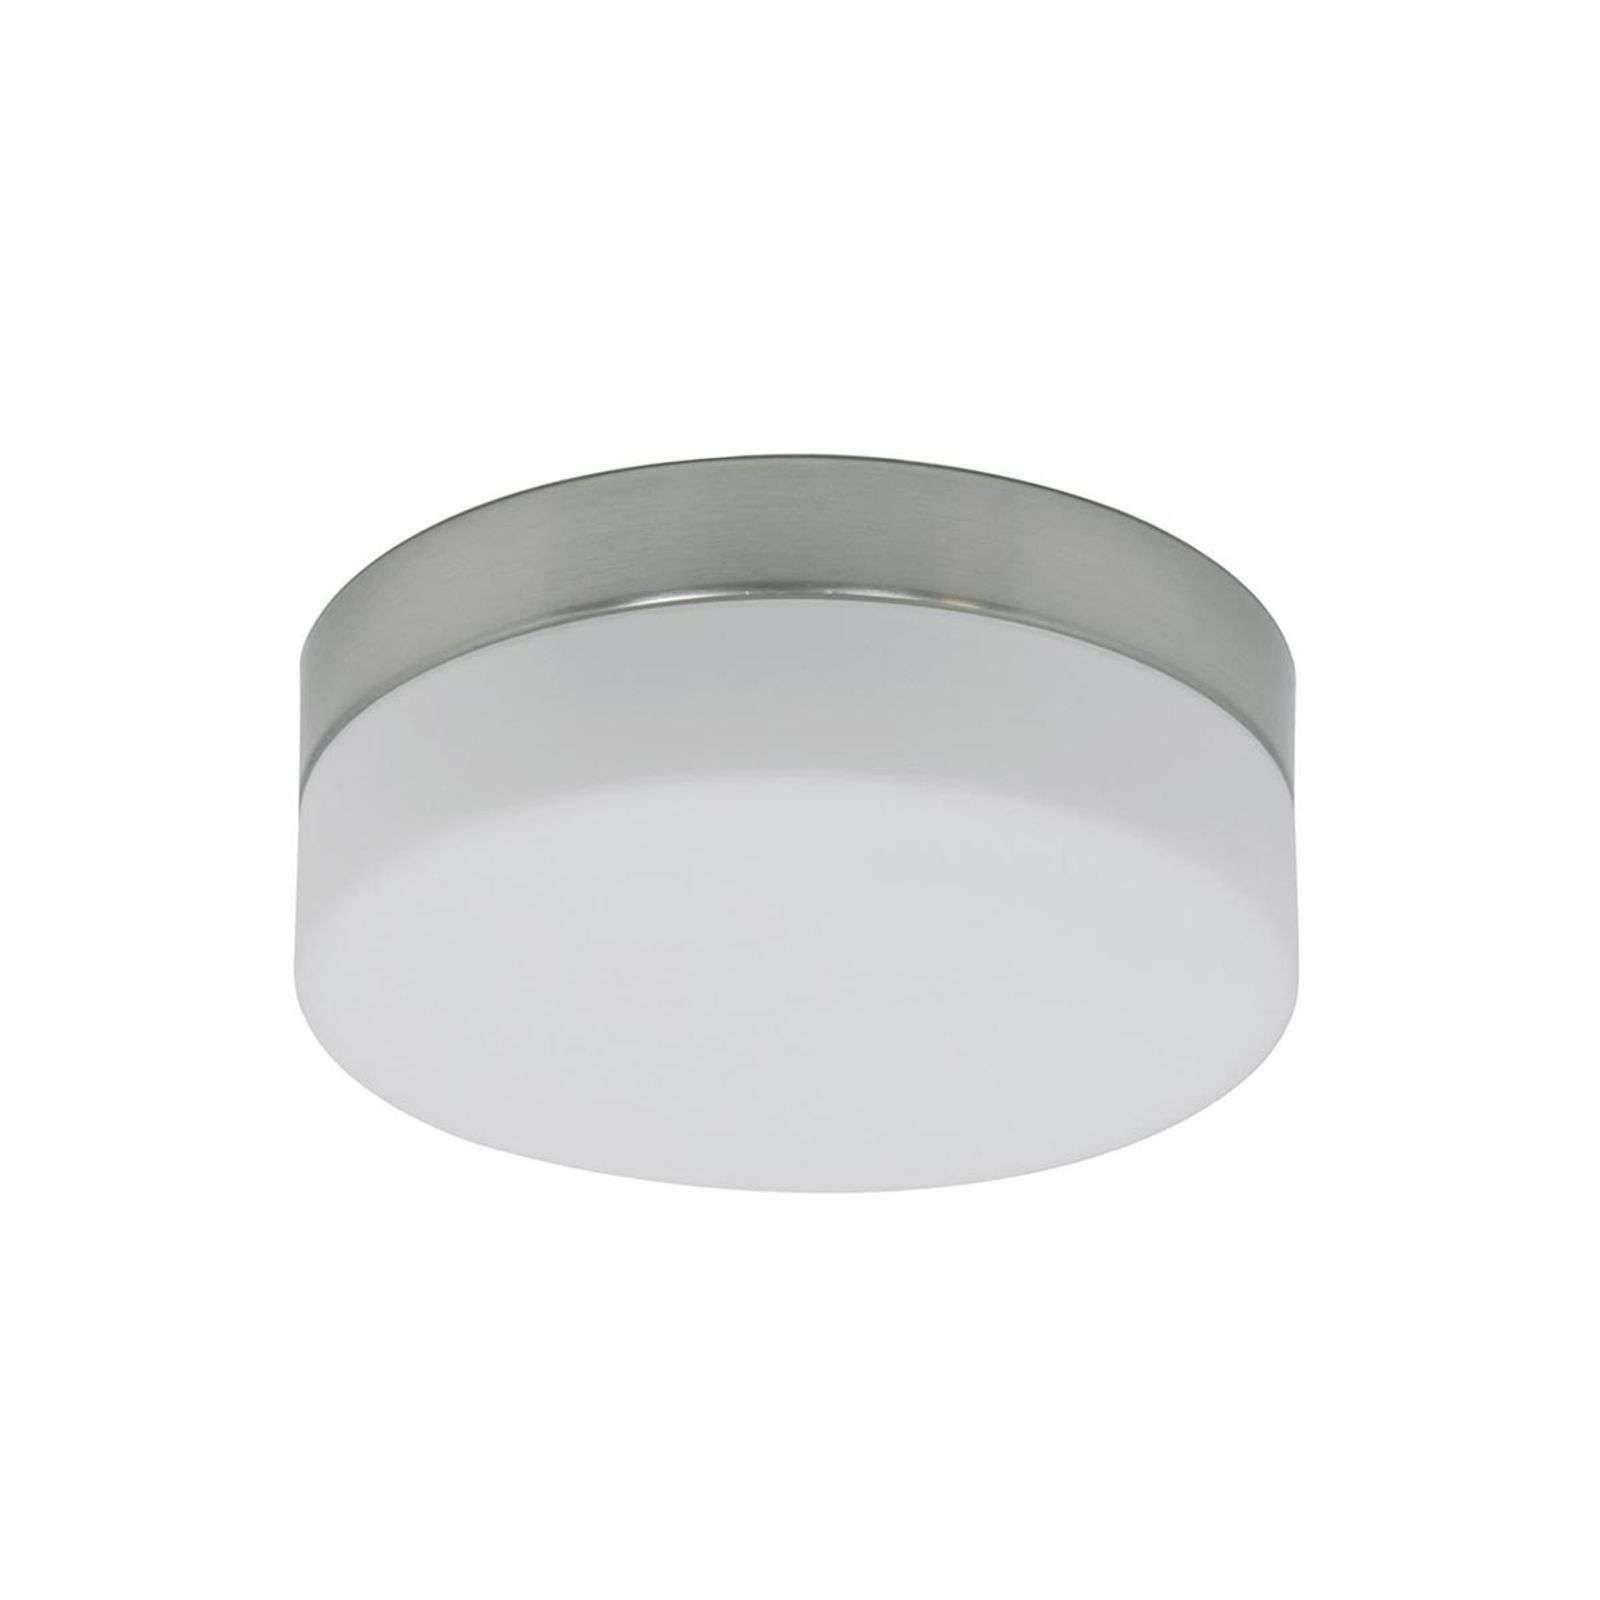 Led Plafondlamp Babylon Met Switch Dimfunctie Van Steinhauer Bv In 2020 Plafondlamp Plafondverlichting Lampenkap